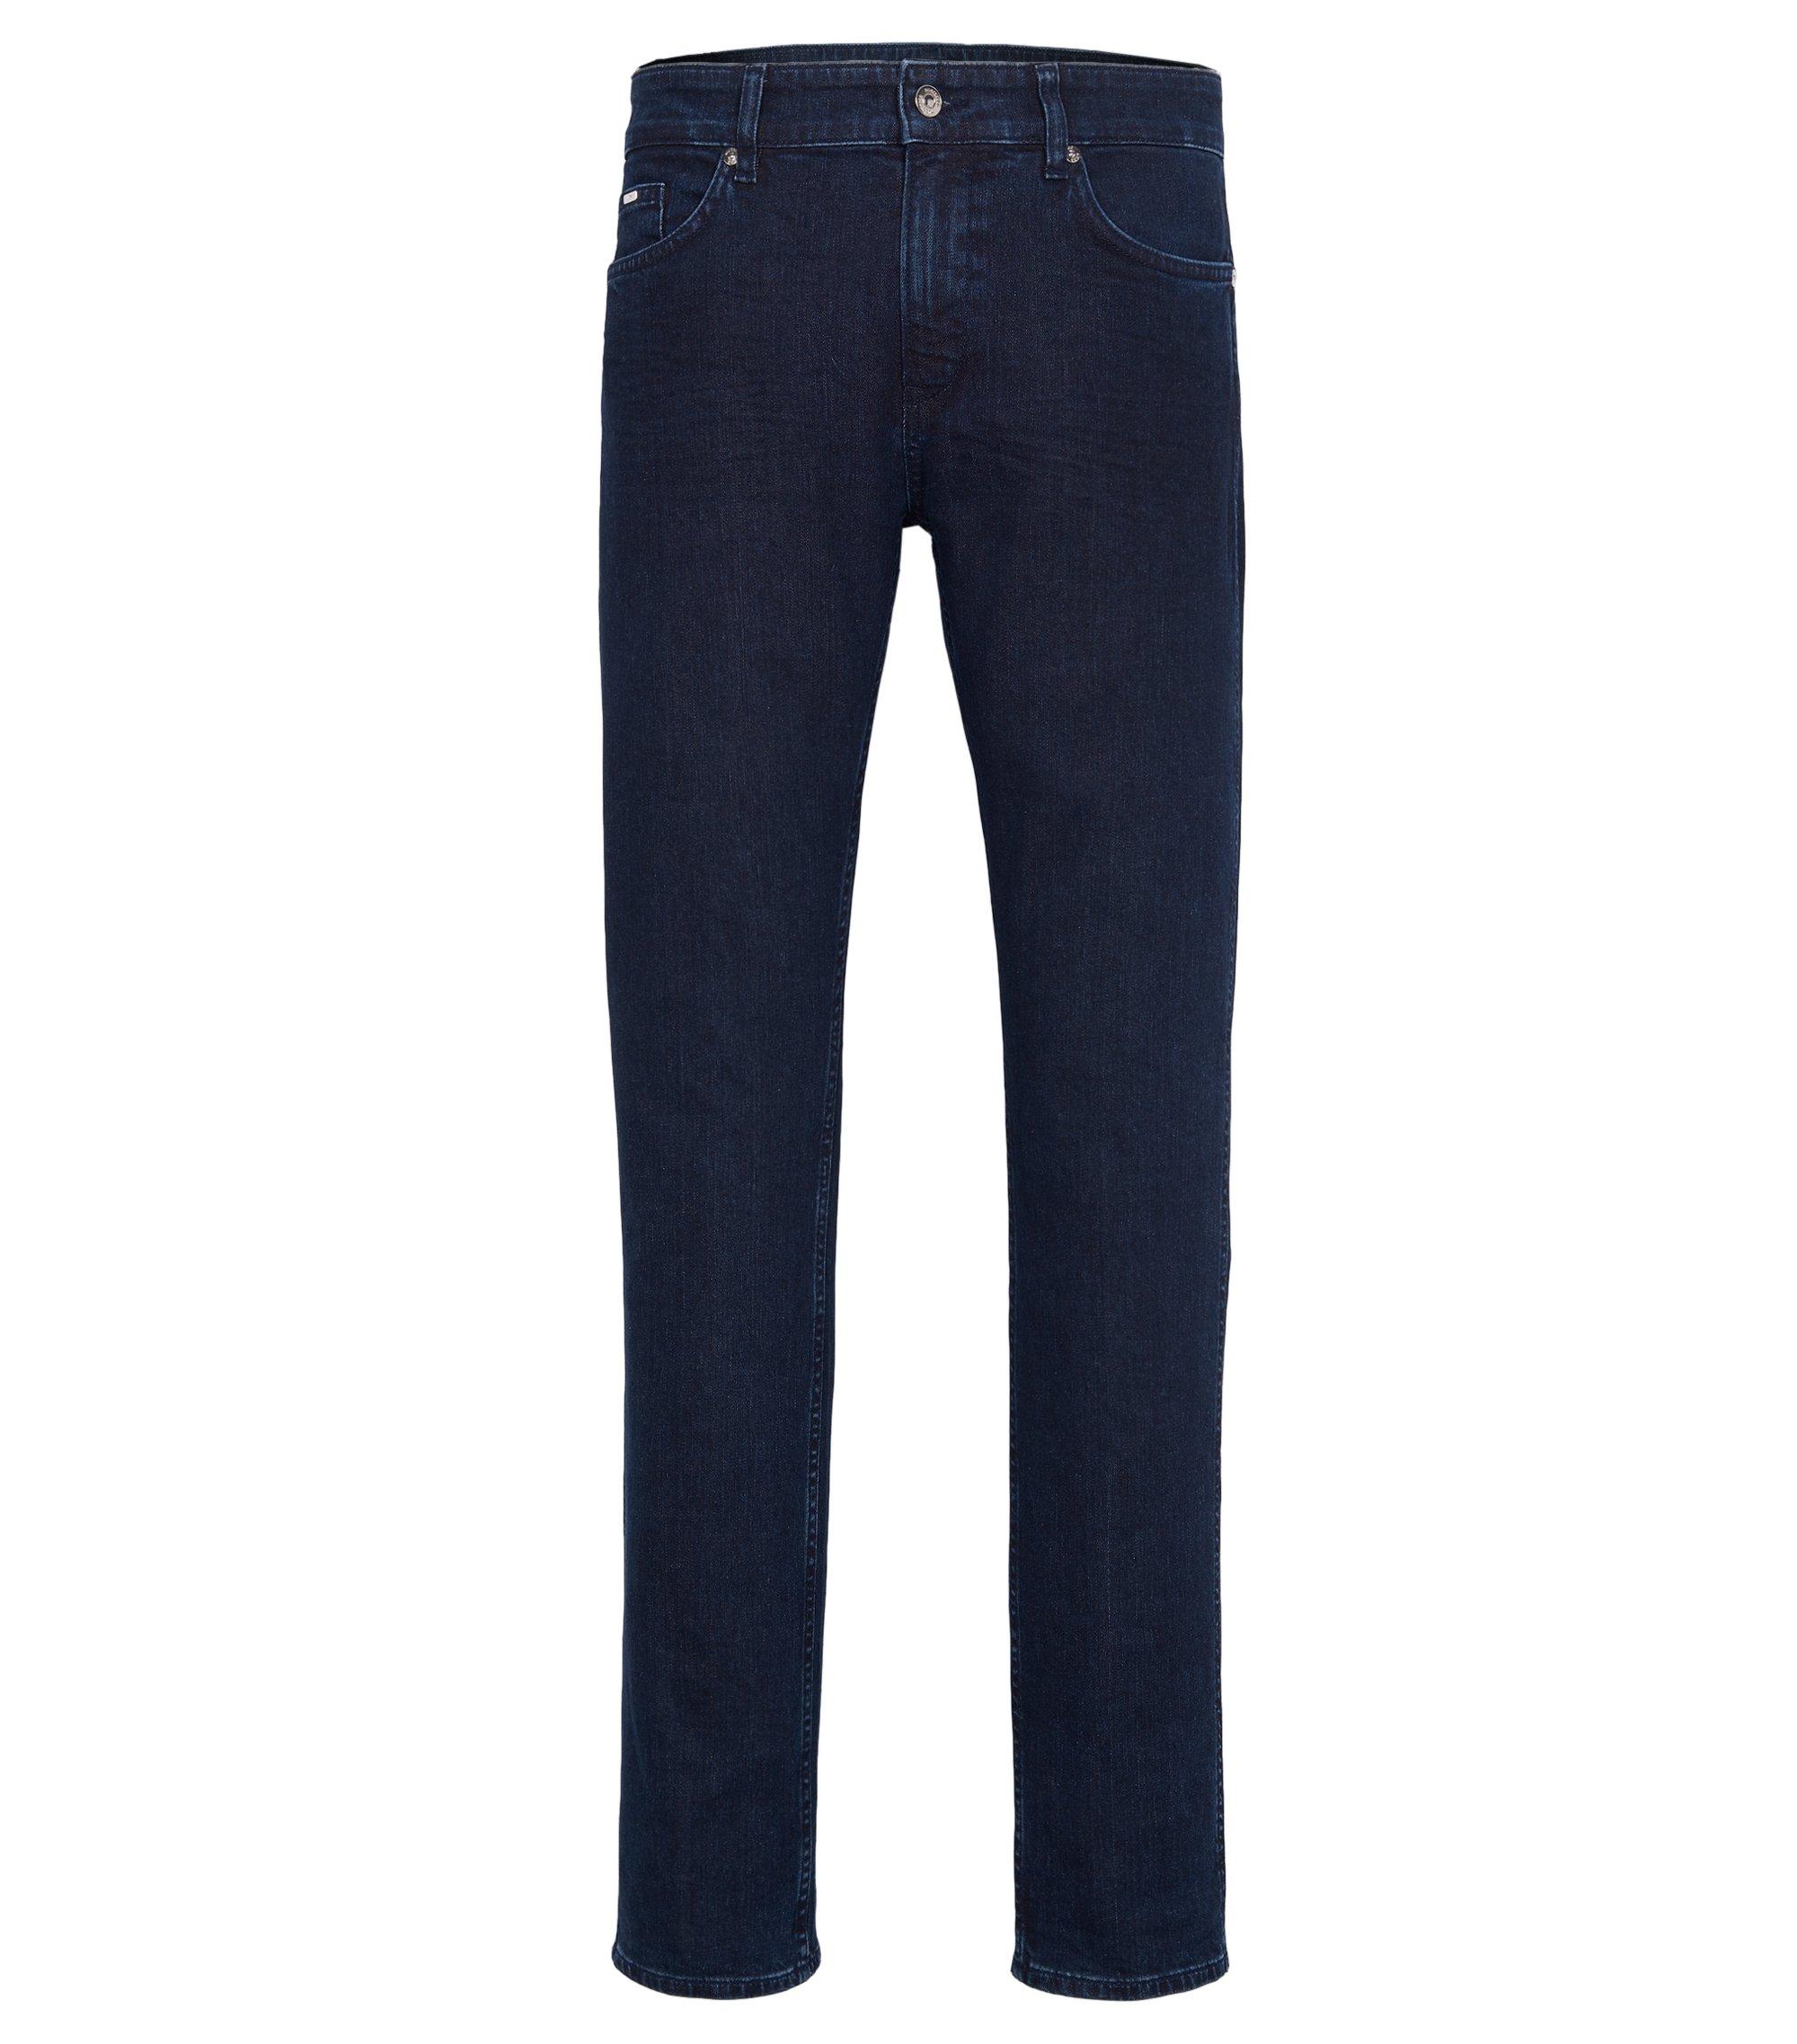 8 oz Stretch Cotton Jeans, Slim Fit | Delaware, Dark Blue